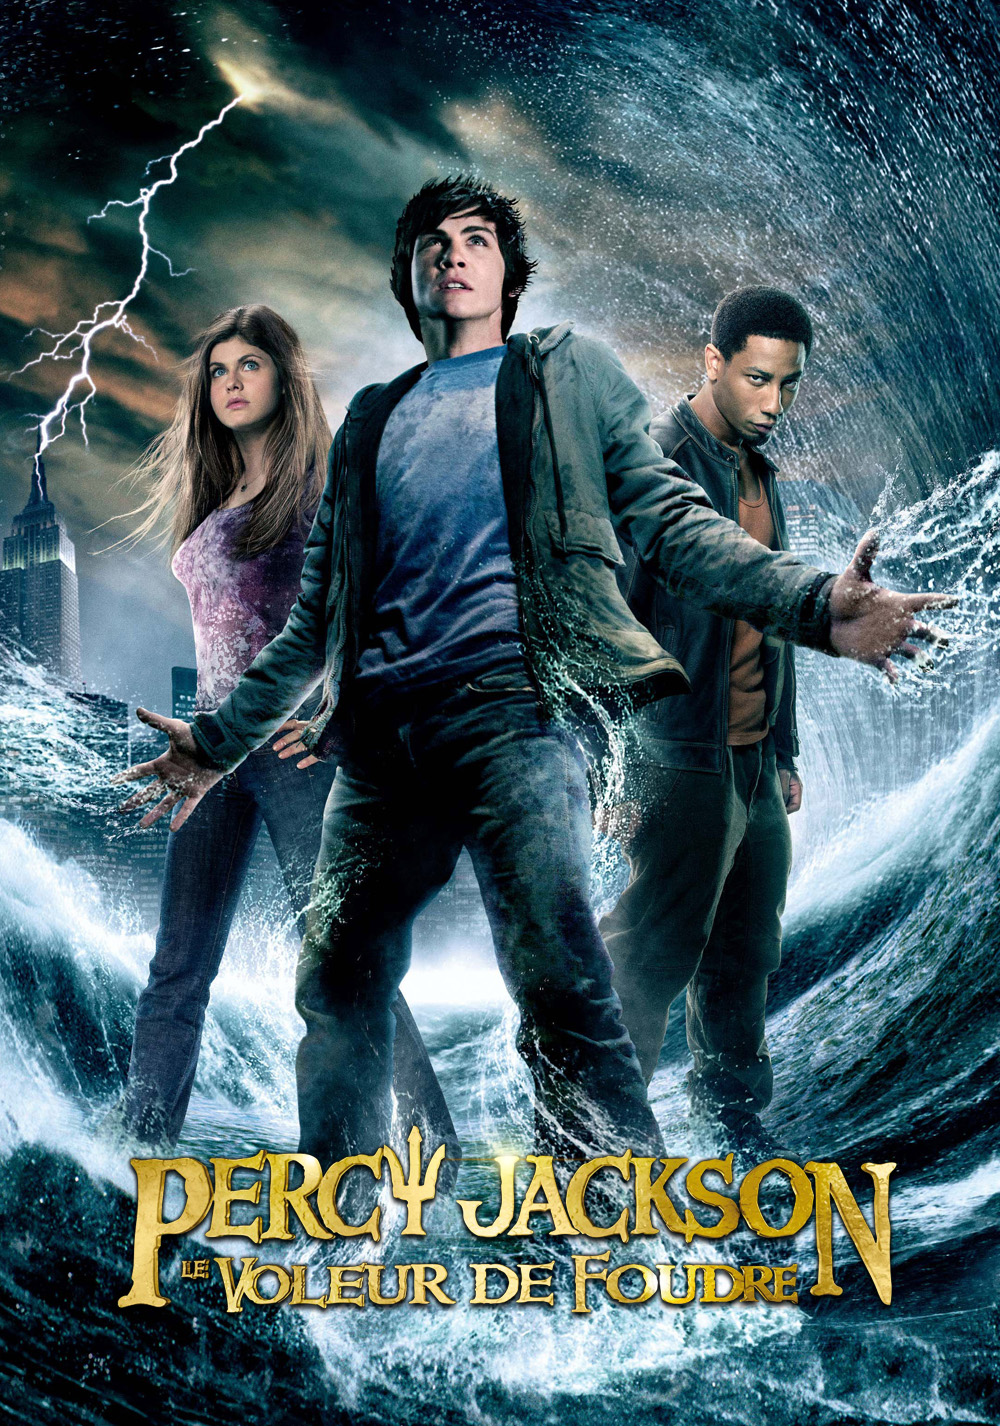 percy jackson film